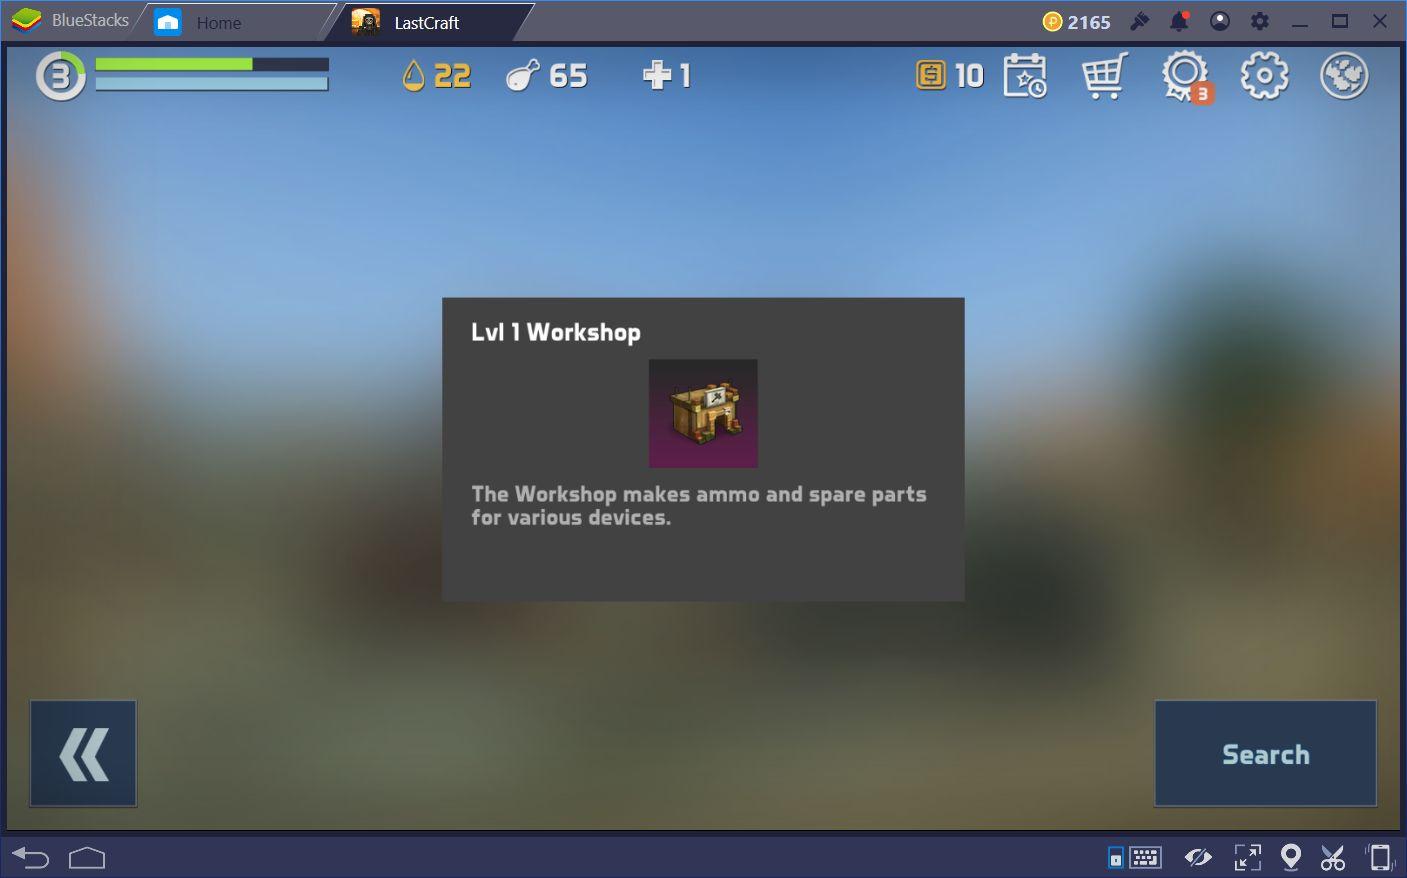 How To Make Swift Progress in LastCraft Survival